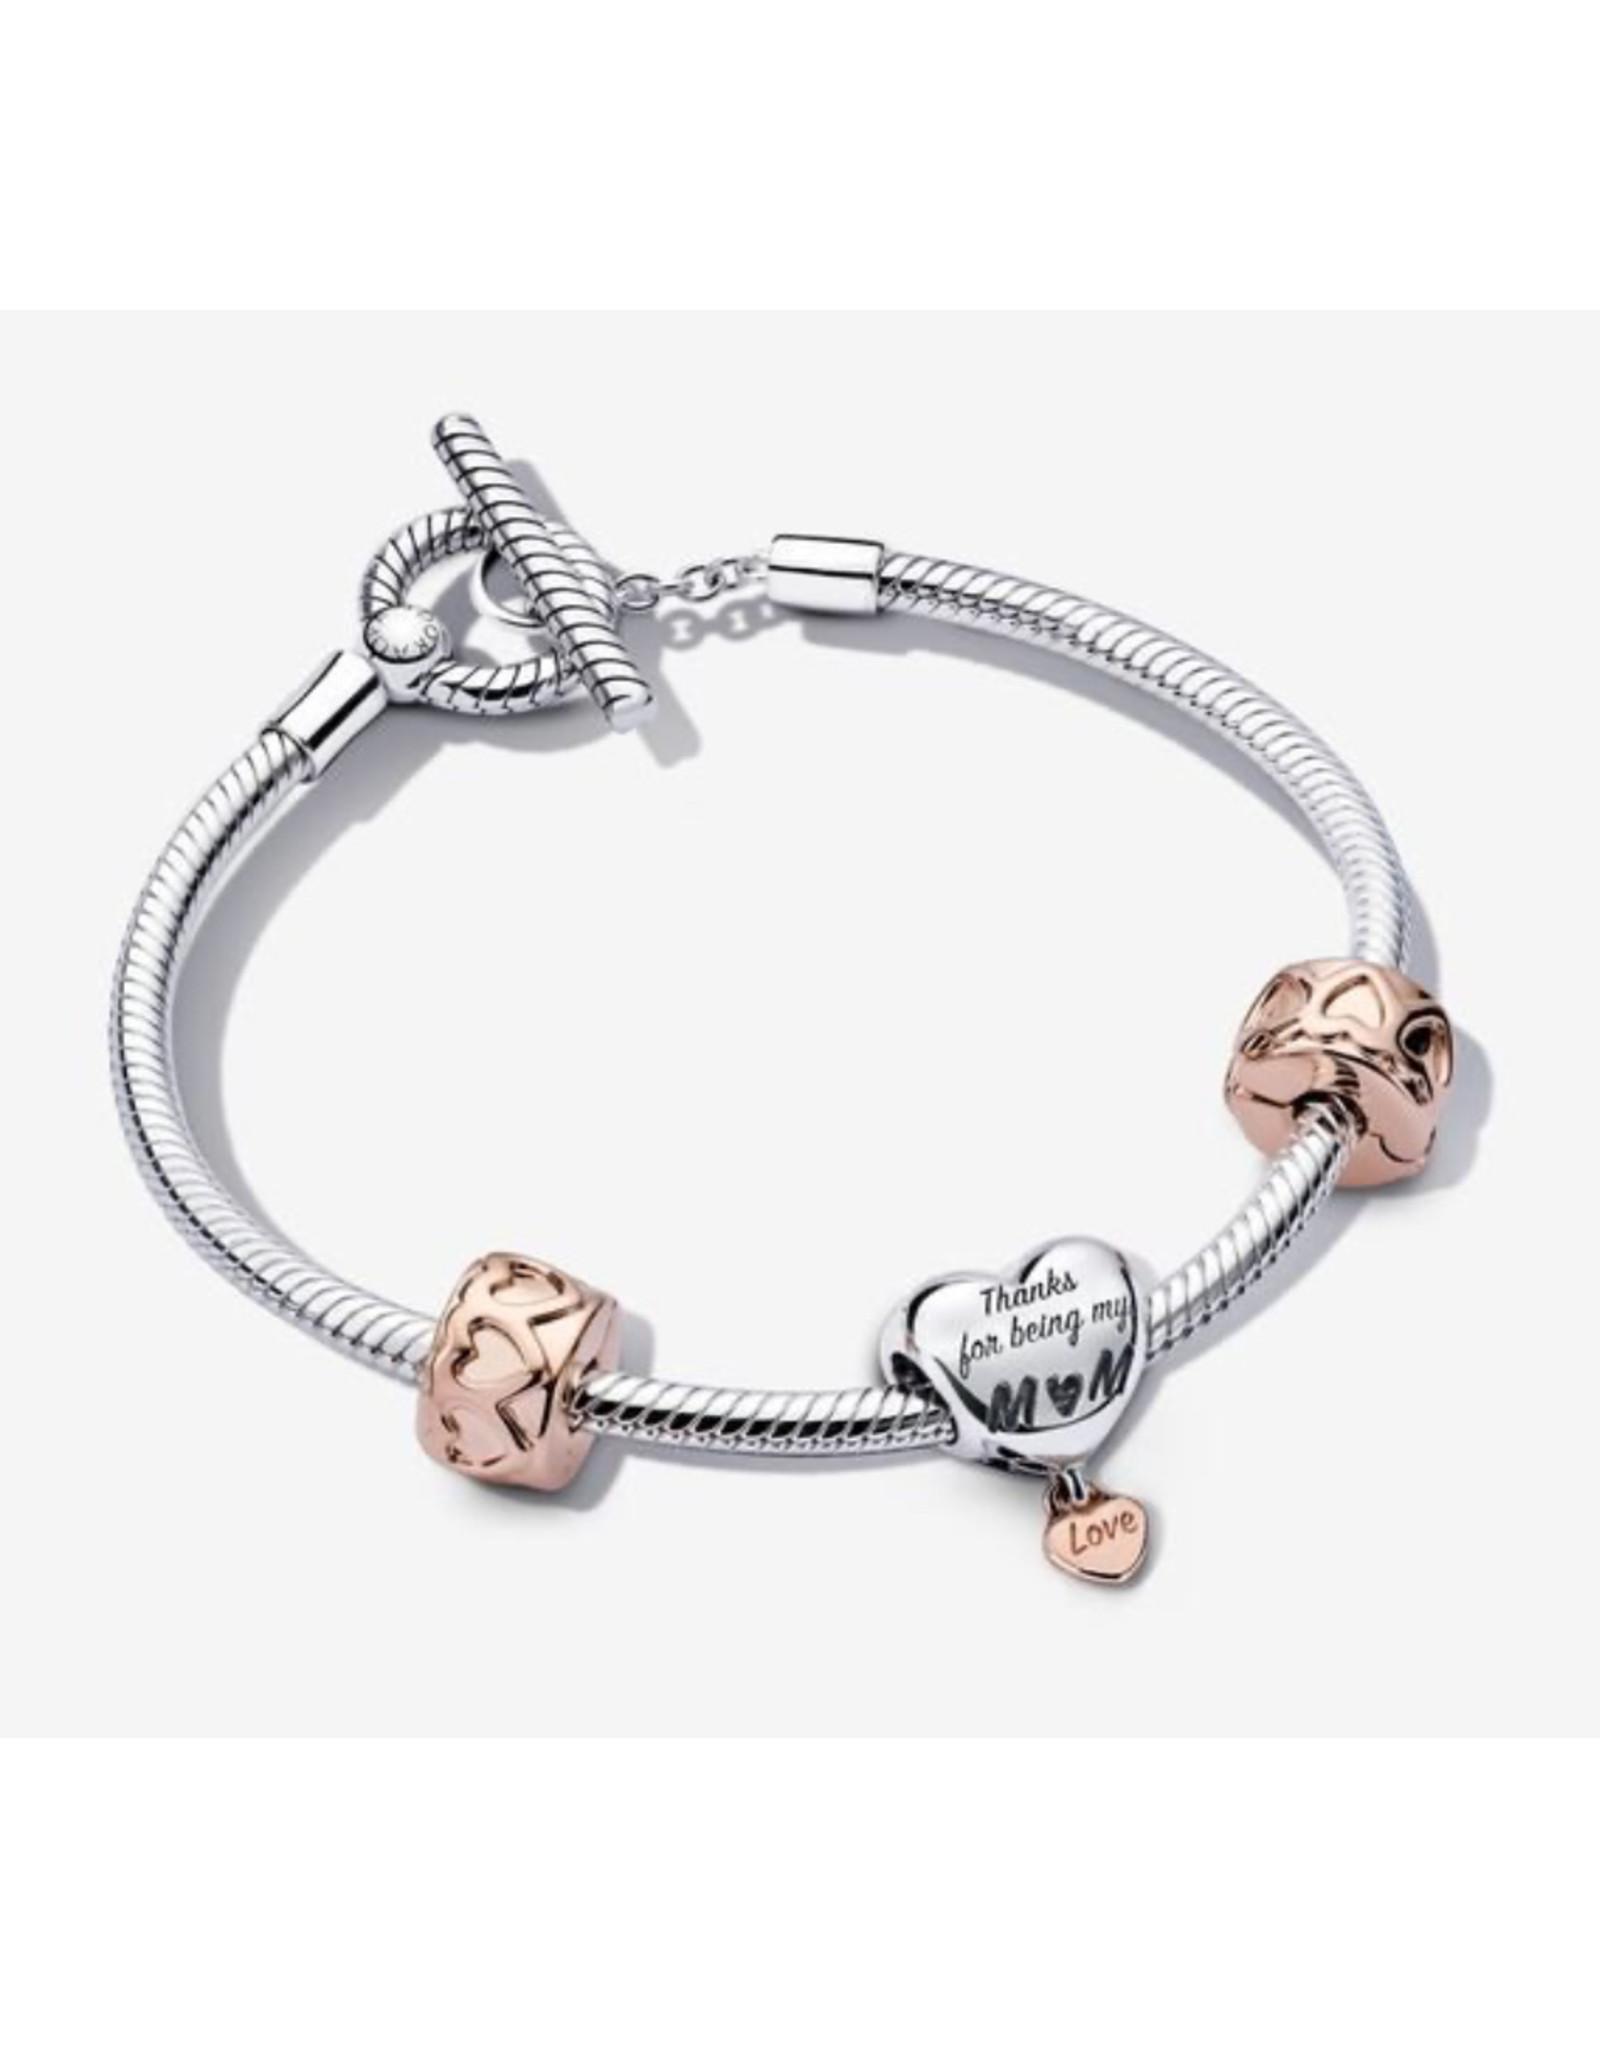 Pandora Pandora Gift Set, B801530-19, Mom's Love Bracelet